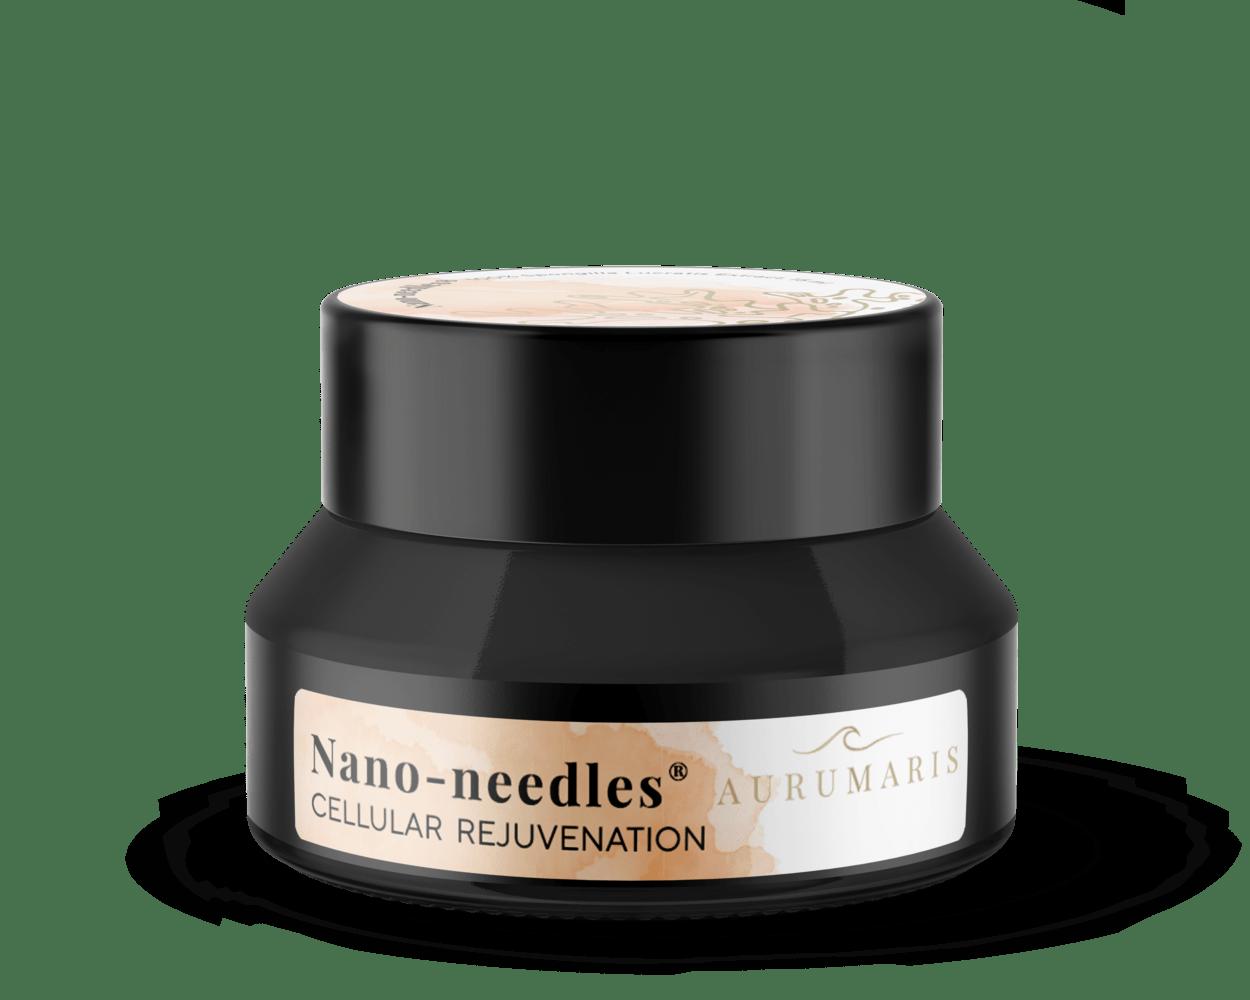 Opinie o Aurumaris nano-needles